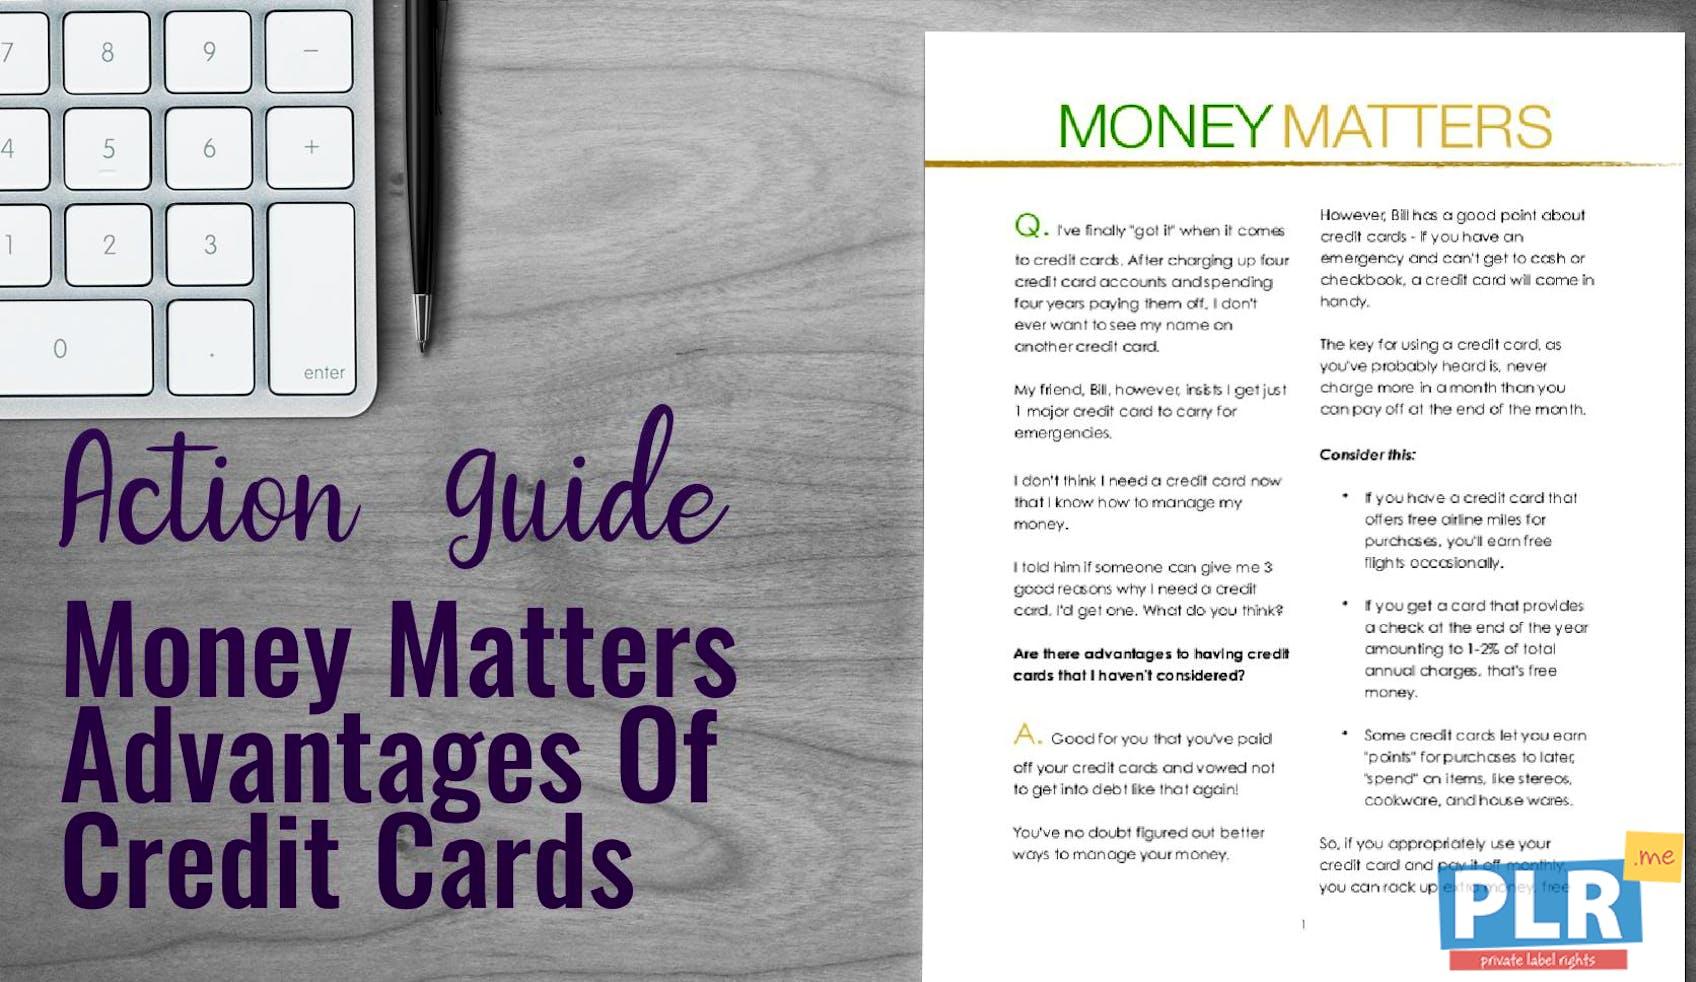 Advantages Of Credit Card >> Money Matters Advantages Of Credit Cards